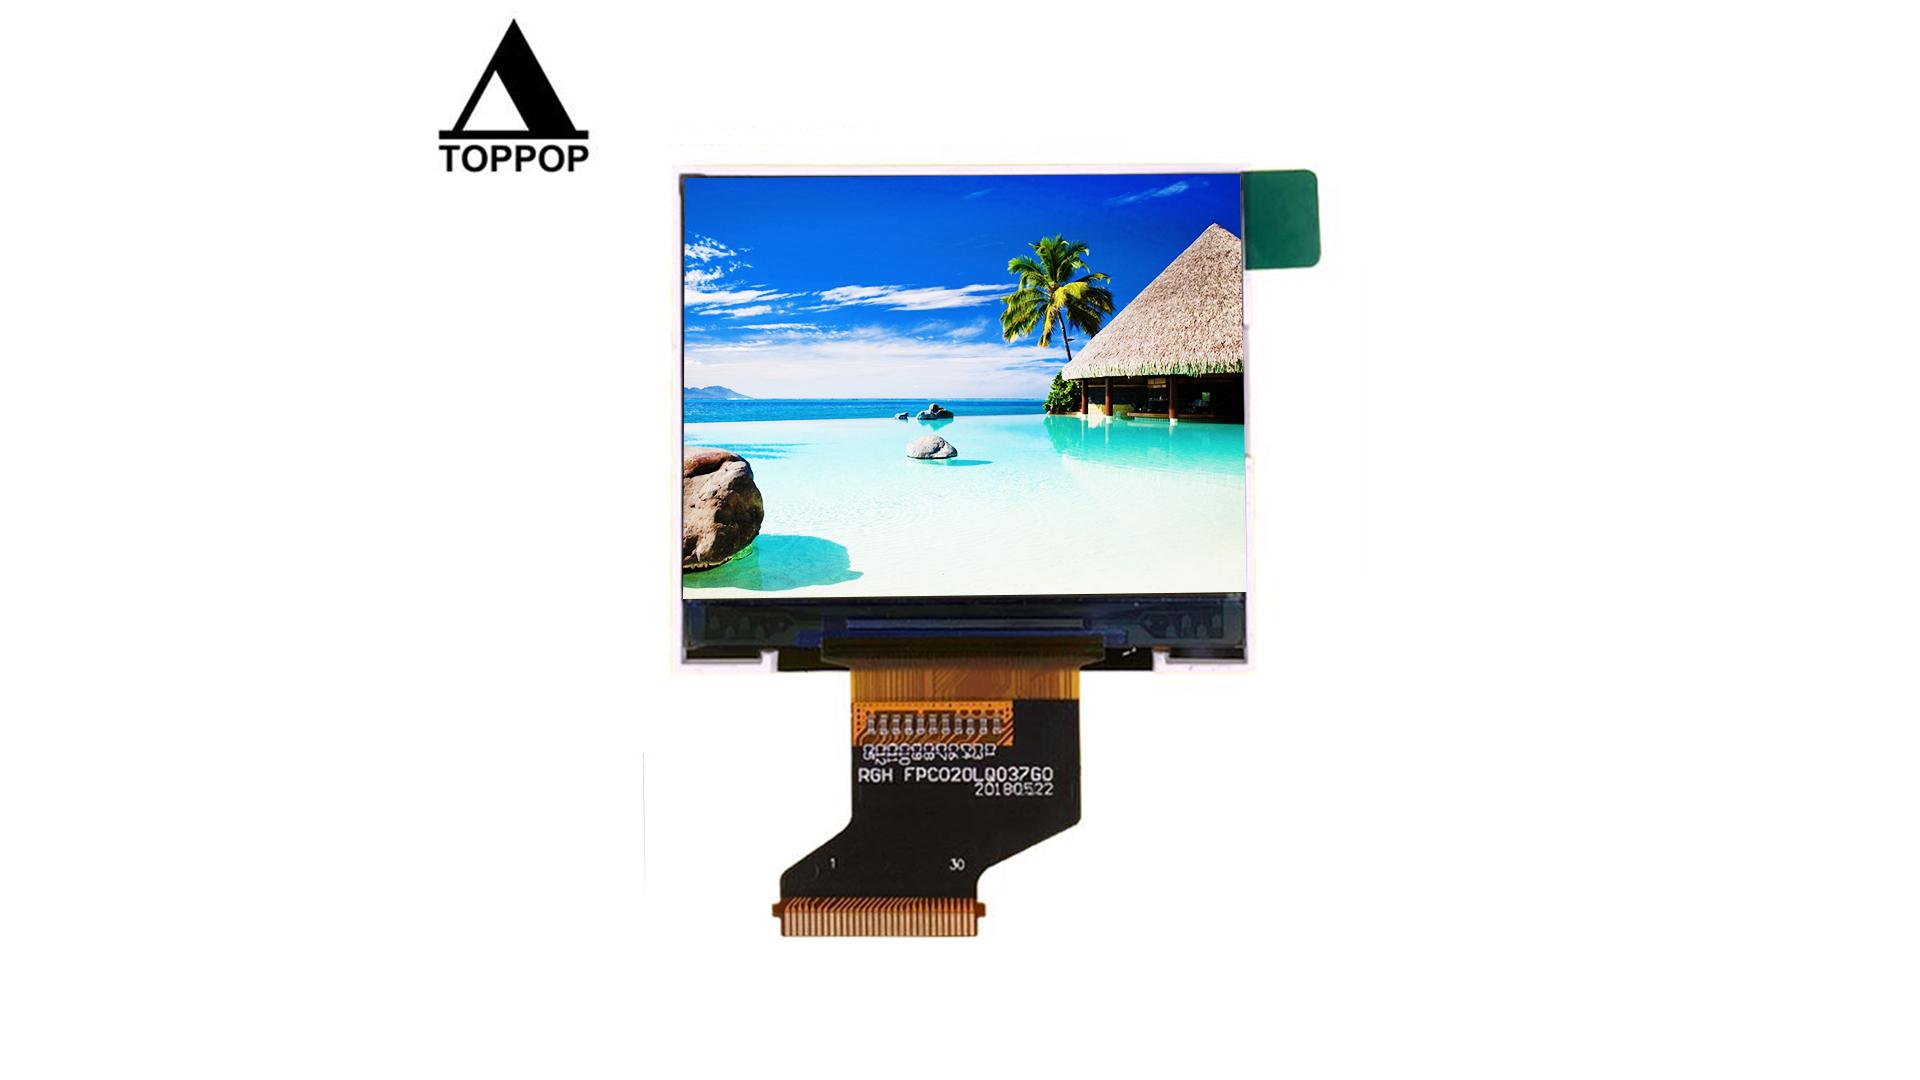 "Cheap 2.0 inch 320*240 Transflective 2.0"" TFT LCD Screen IPS lcd display screen Free Angle Outdoor Sunlight Readable LCD Display Panel LCM Module MCU ILI9342C toppoplcd"